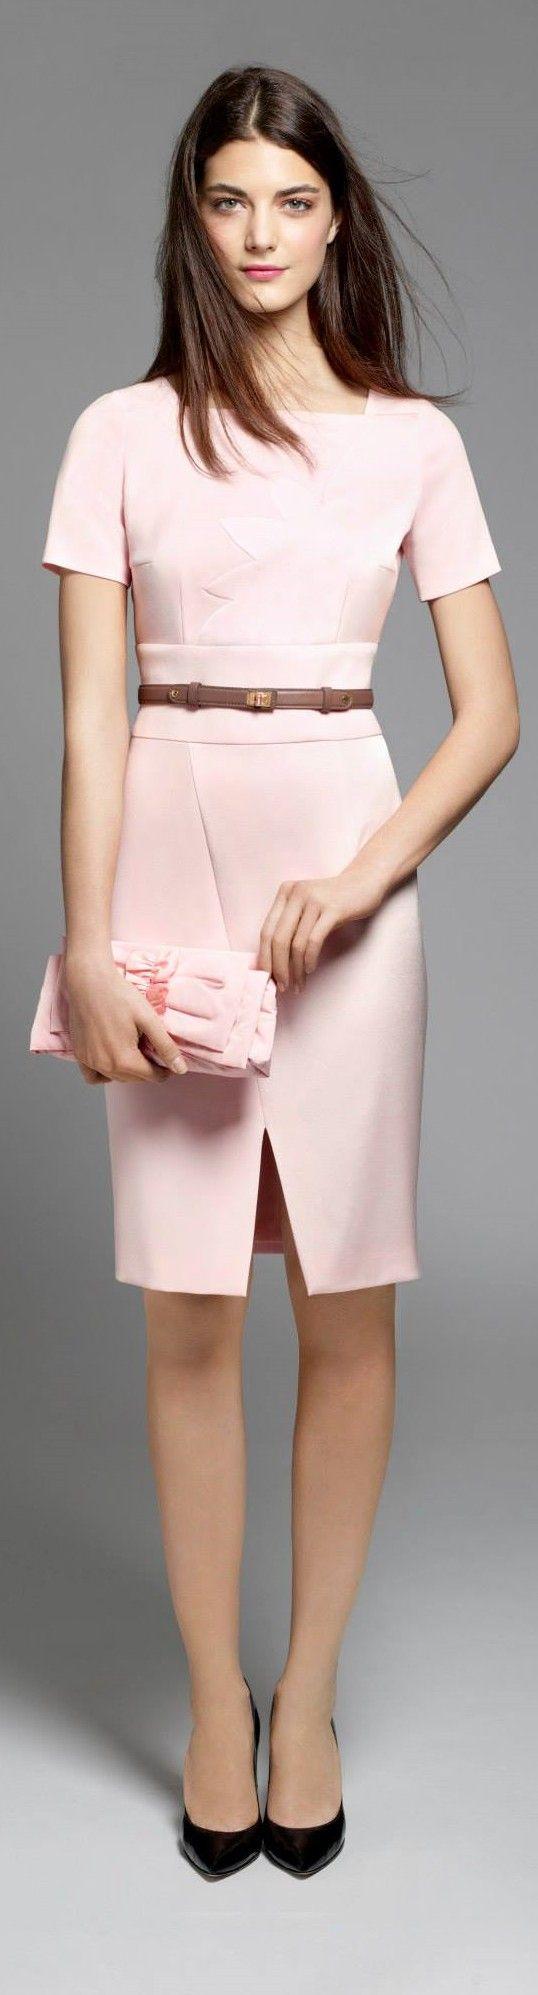 Paule Ka coral suit. Fall autumn women fashion outfit clothing stylish apparel @roressclothes closet ideas